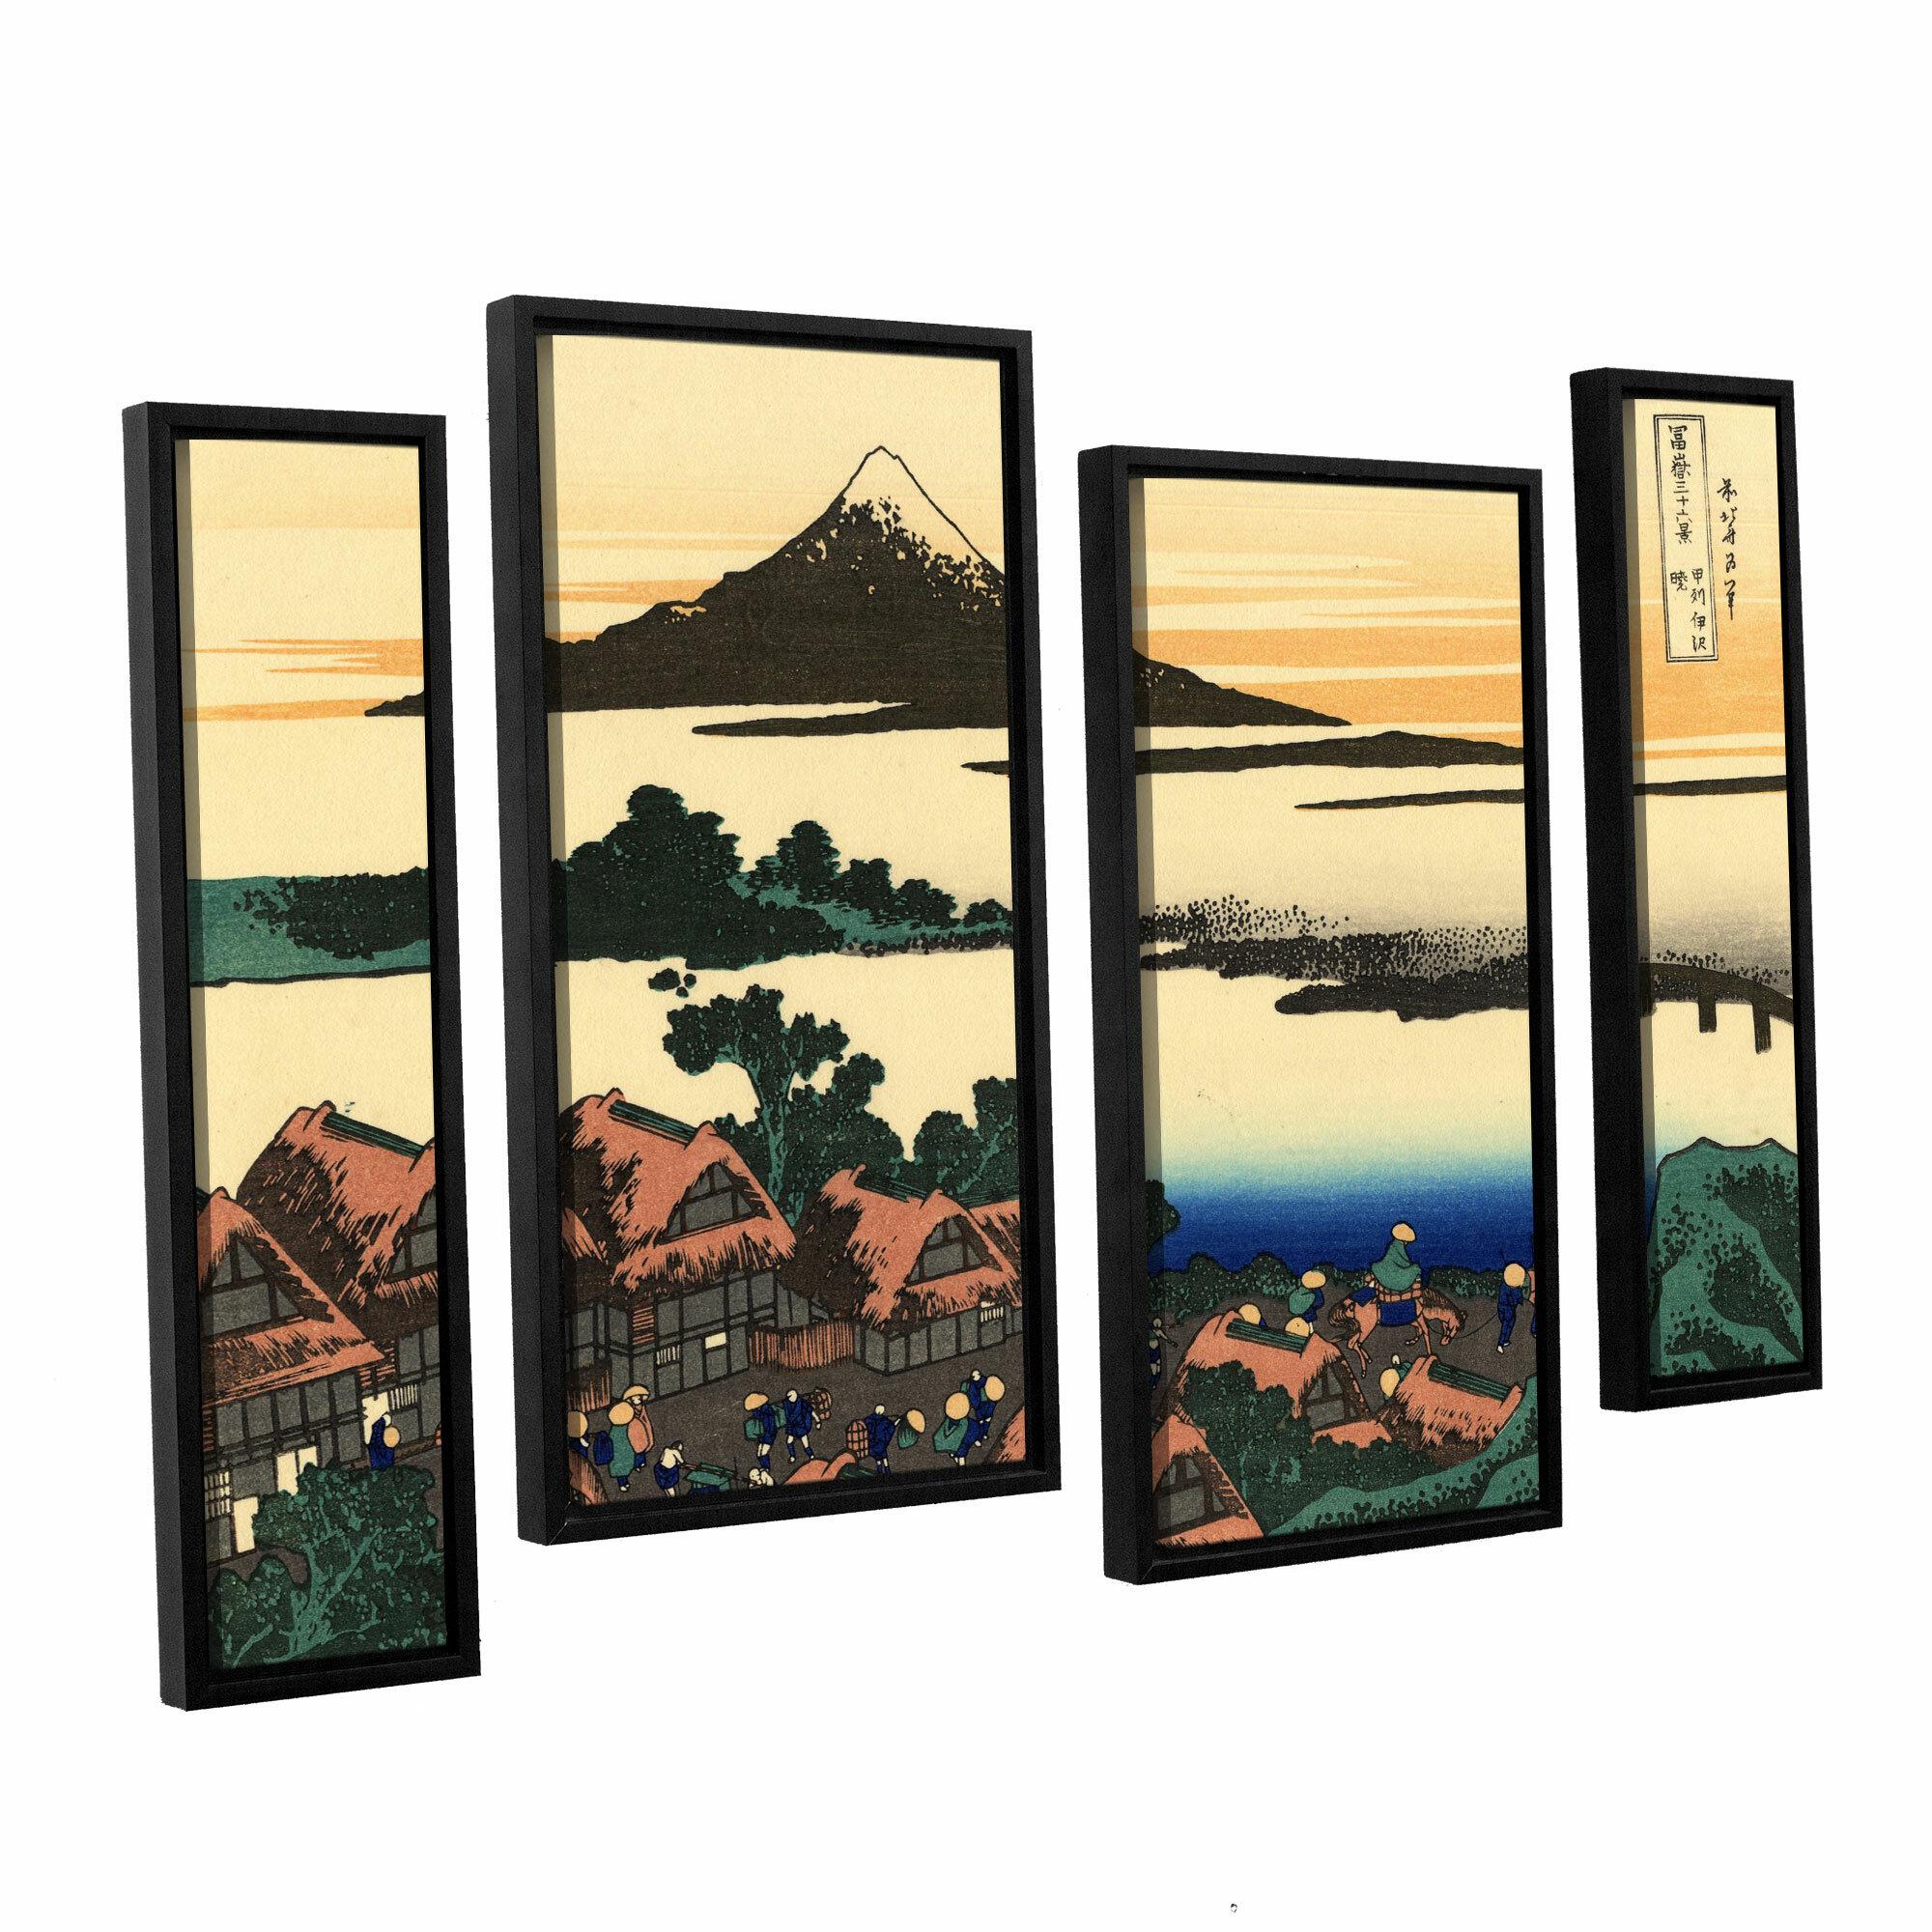 Vault W Artwork Dawn At Isawa In The Kai Province By Katsushika Hokusai Print Multi Piece Image On Canvas Wayfair